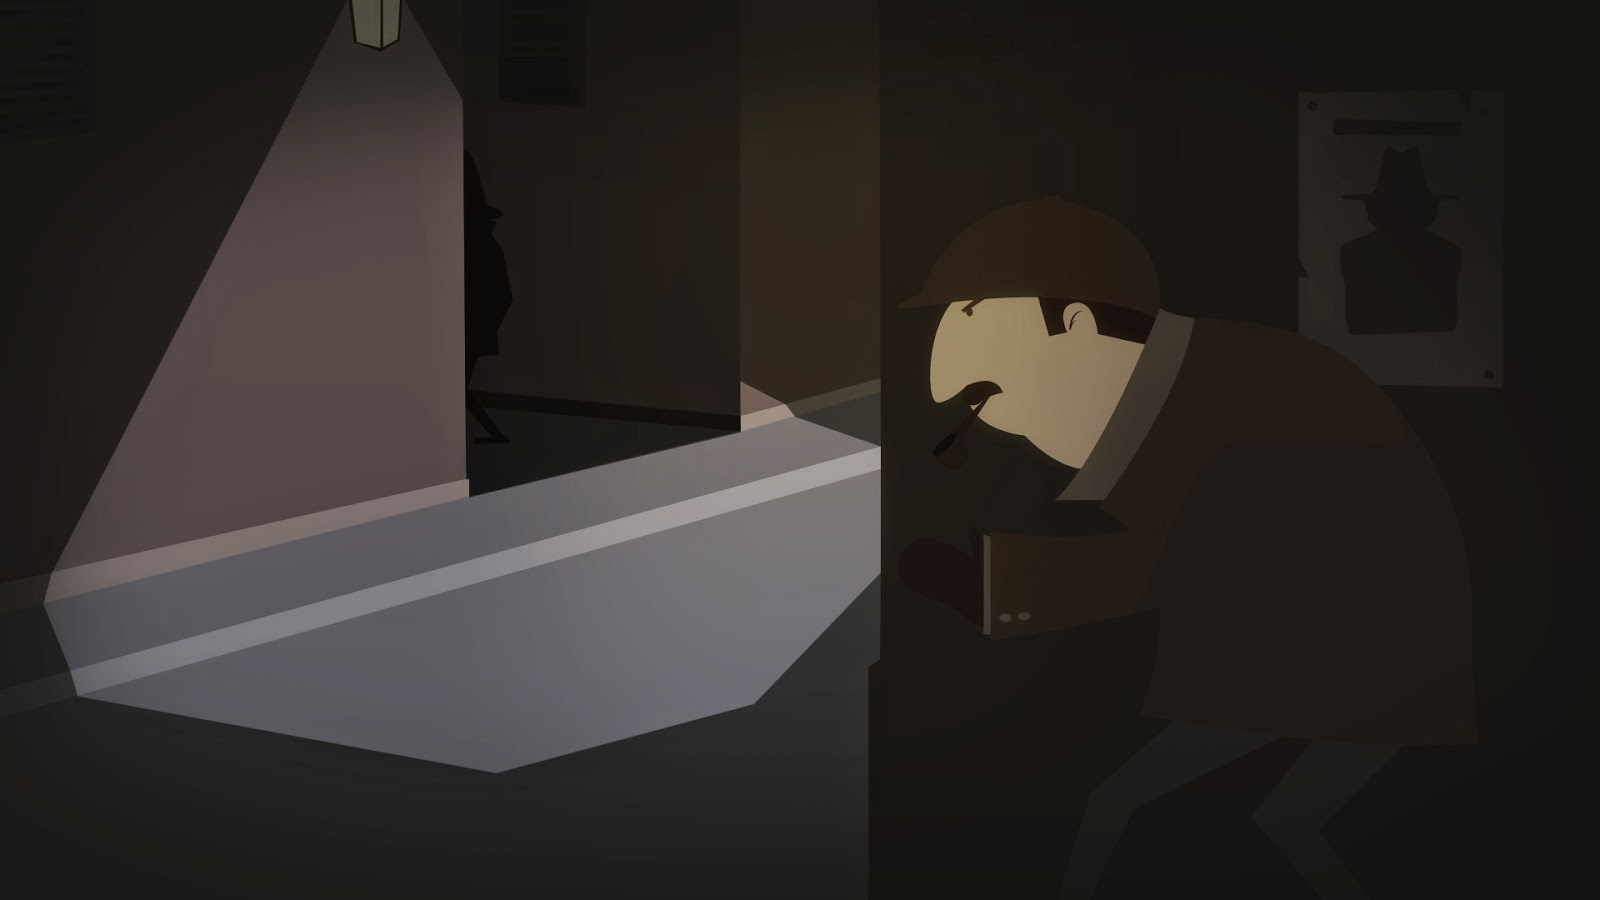 Sherlock Holmes inspired illustration